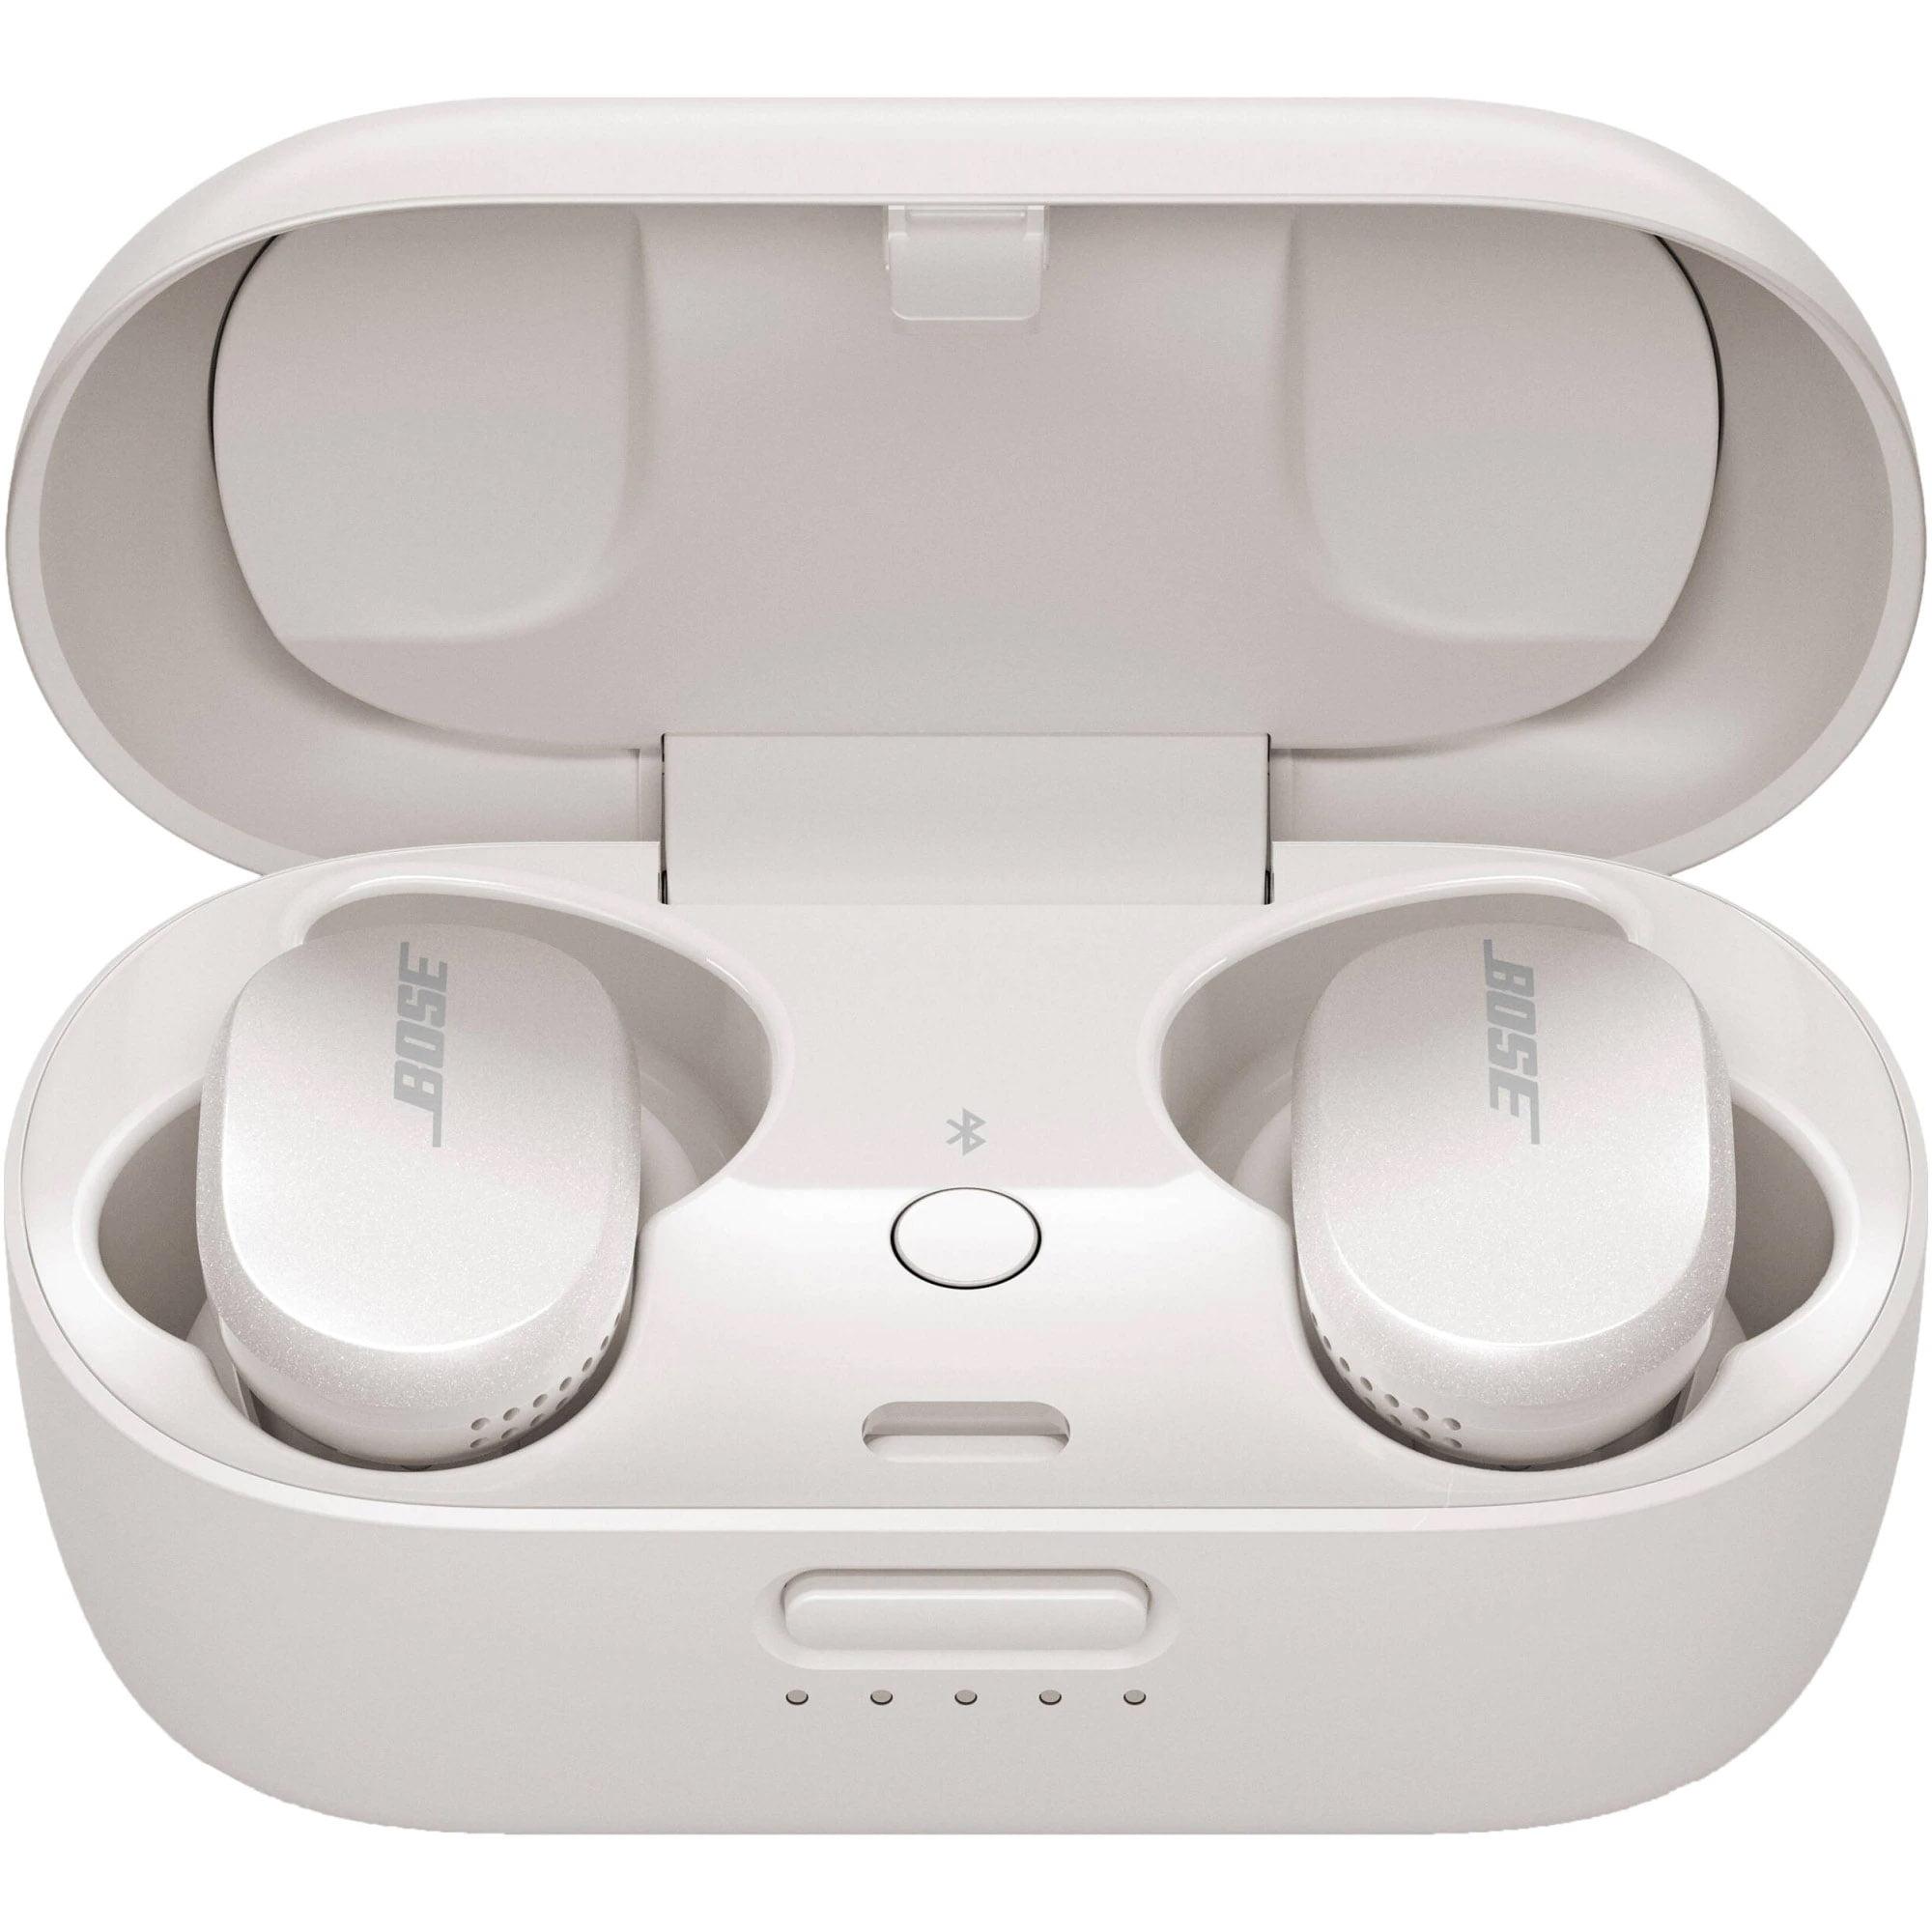 Casti In-Ear Bose QuietComfort, Bluetooth, Microfon, Noise Cancelling, Carcasa de incarcare, Soapstone